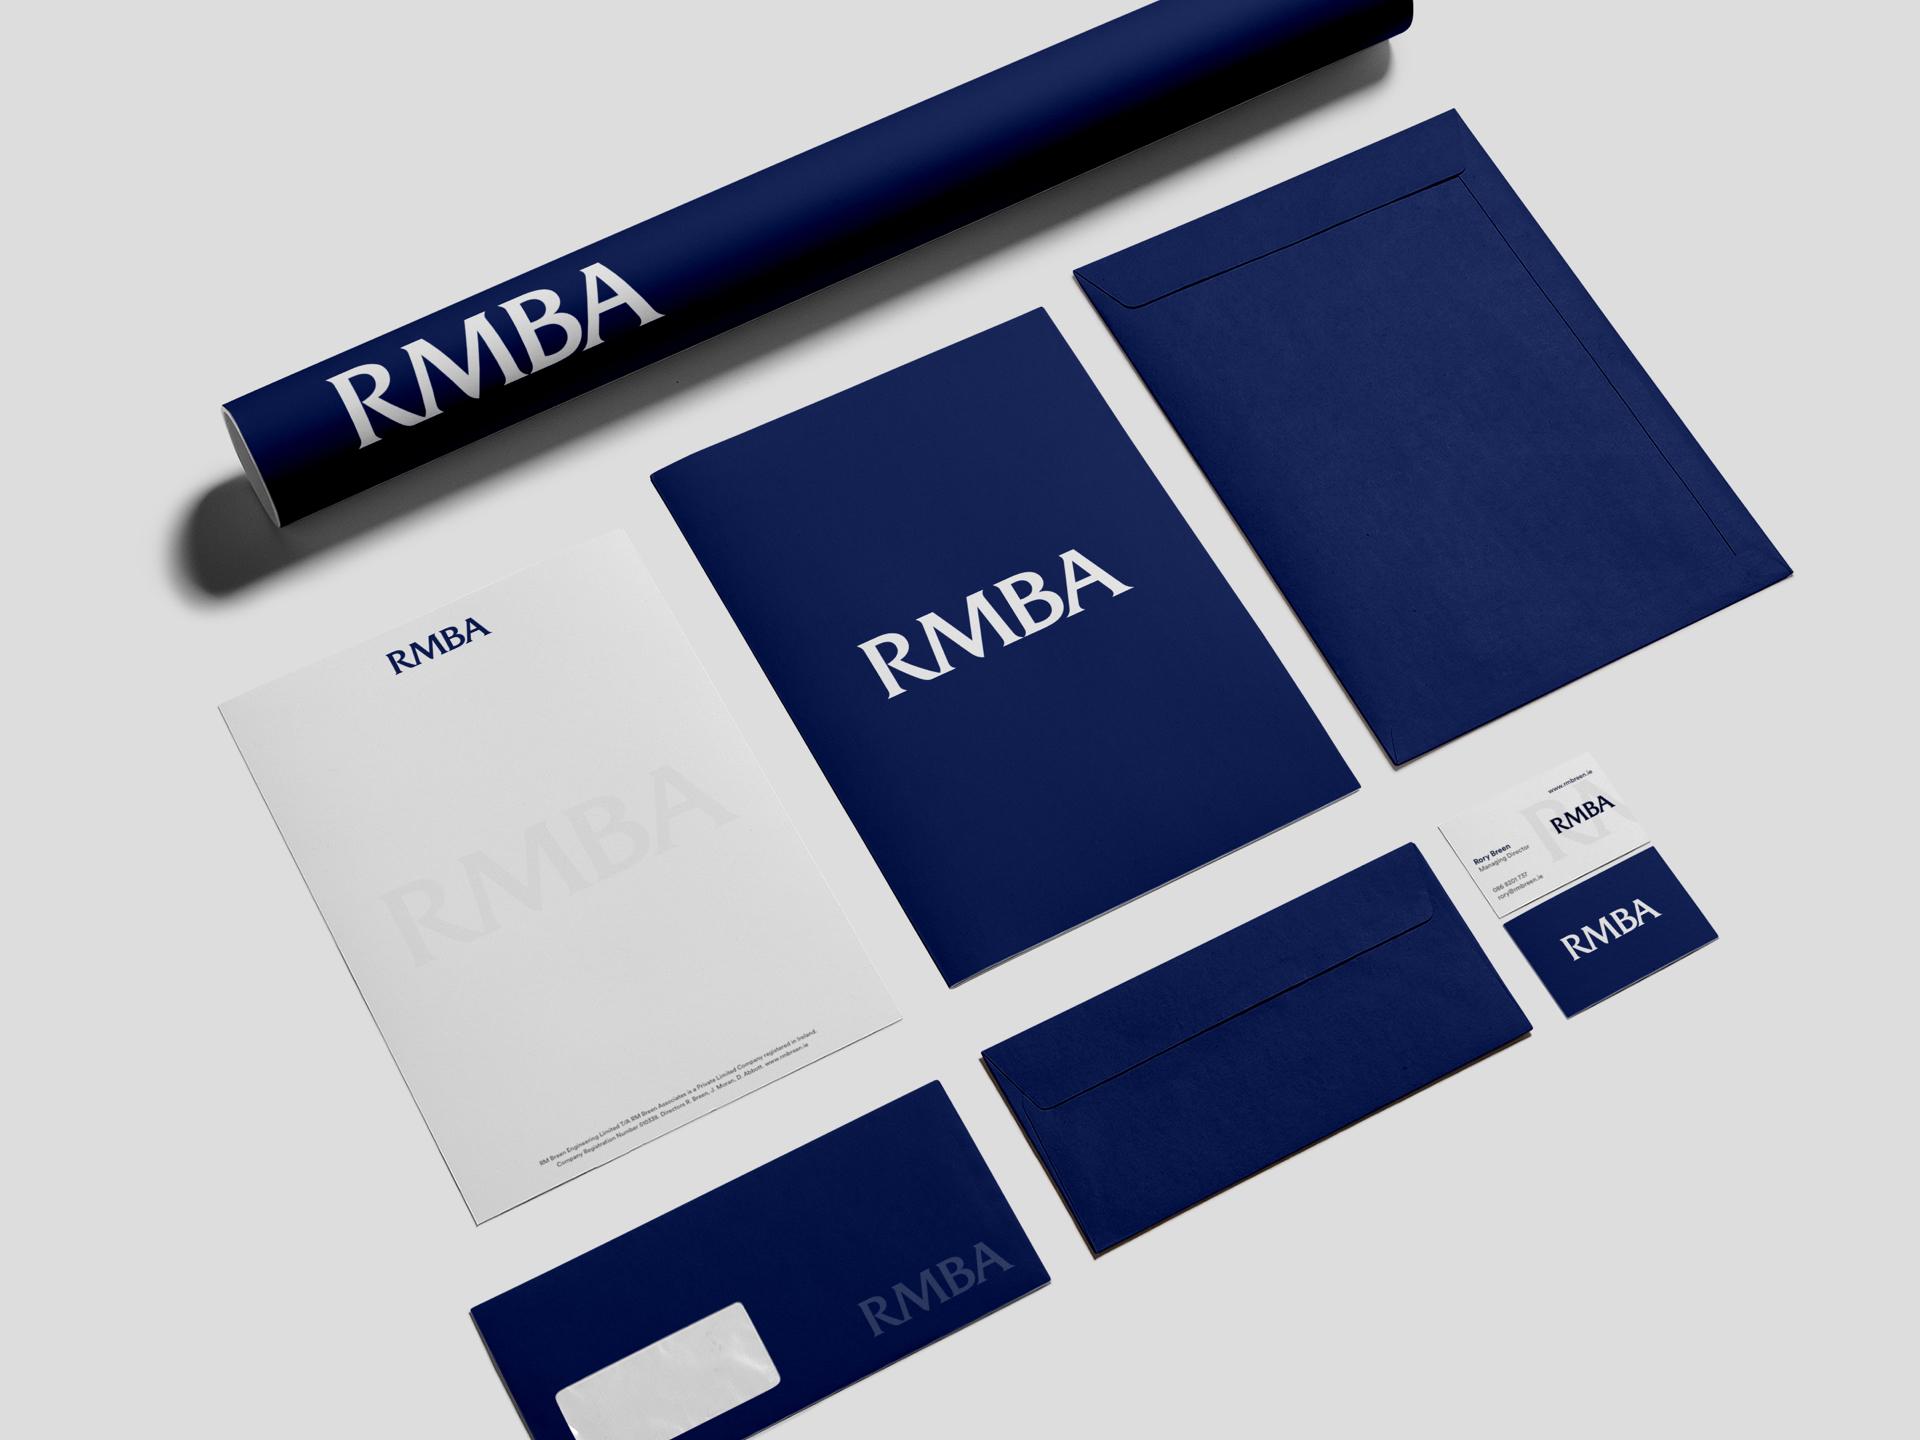 rmba_sme_branding_design